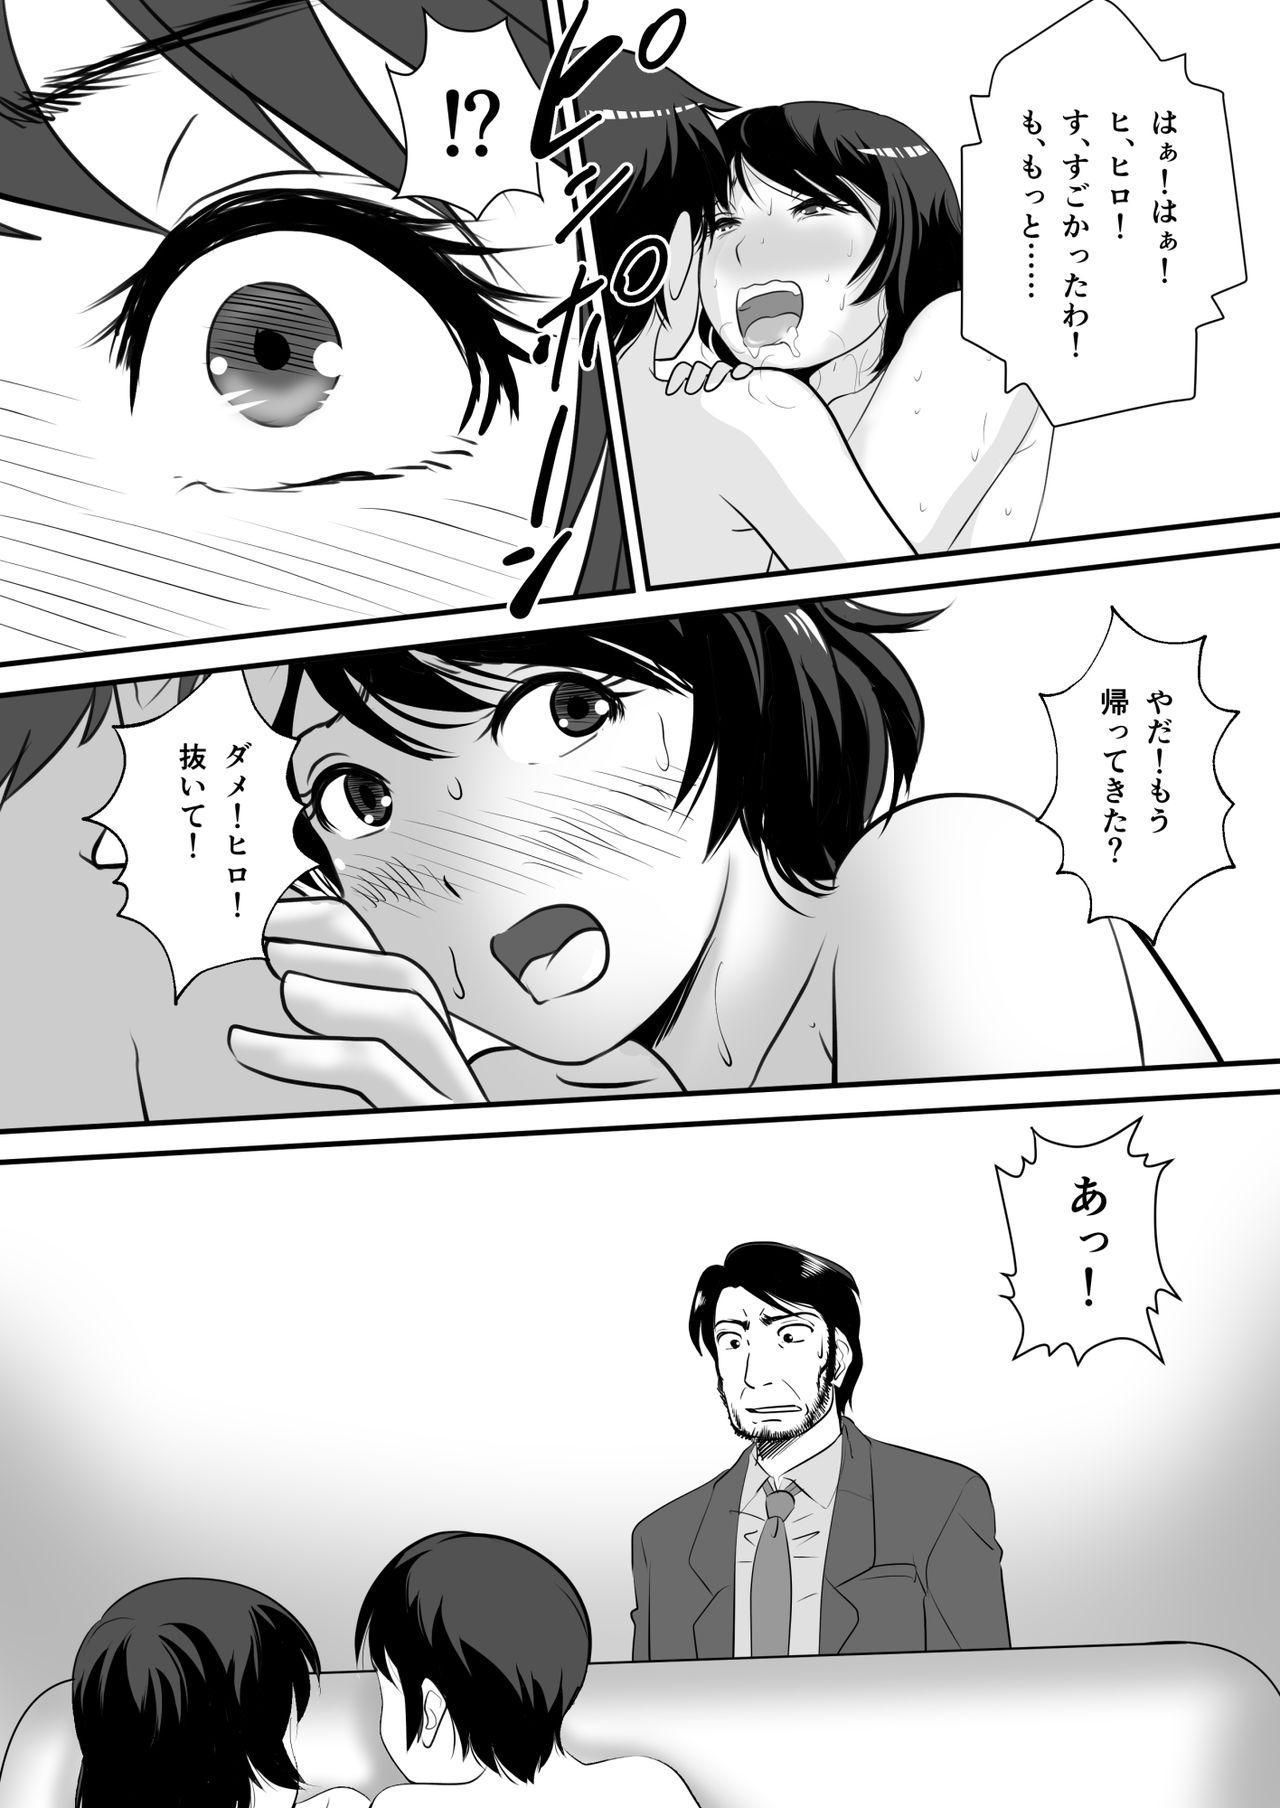 [Milky Club] Netori Appli -Kuso Oyaji kara Kaa-san o Netotta ken- 24